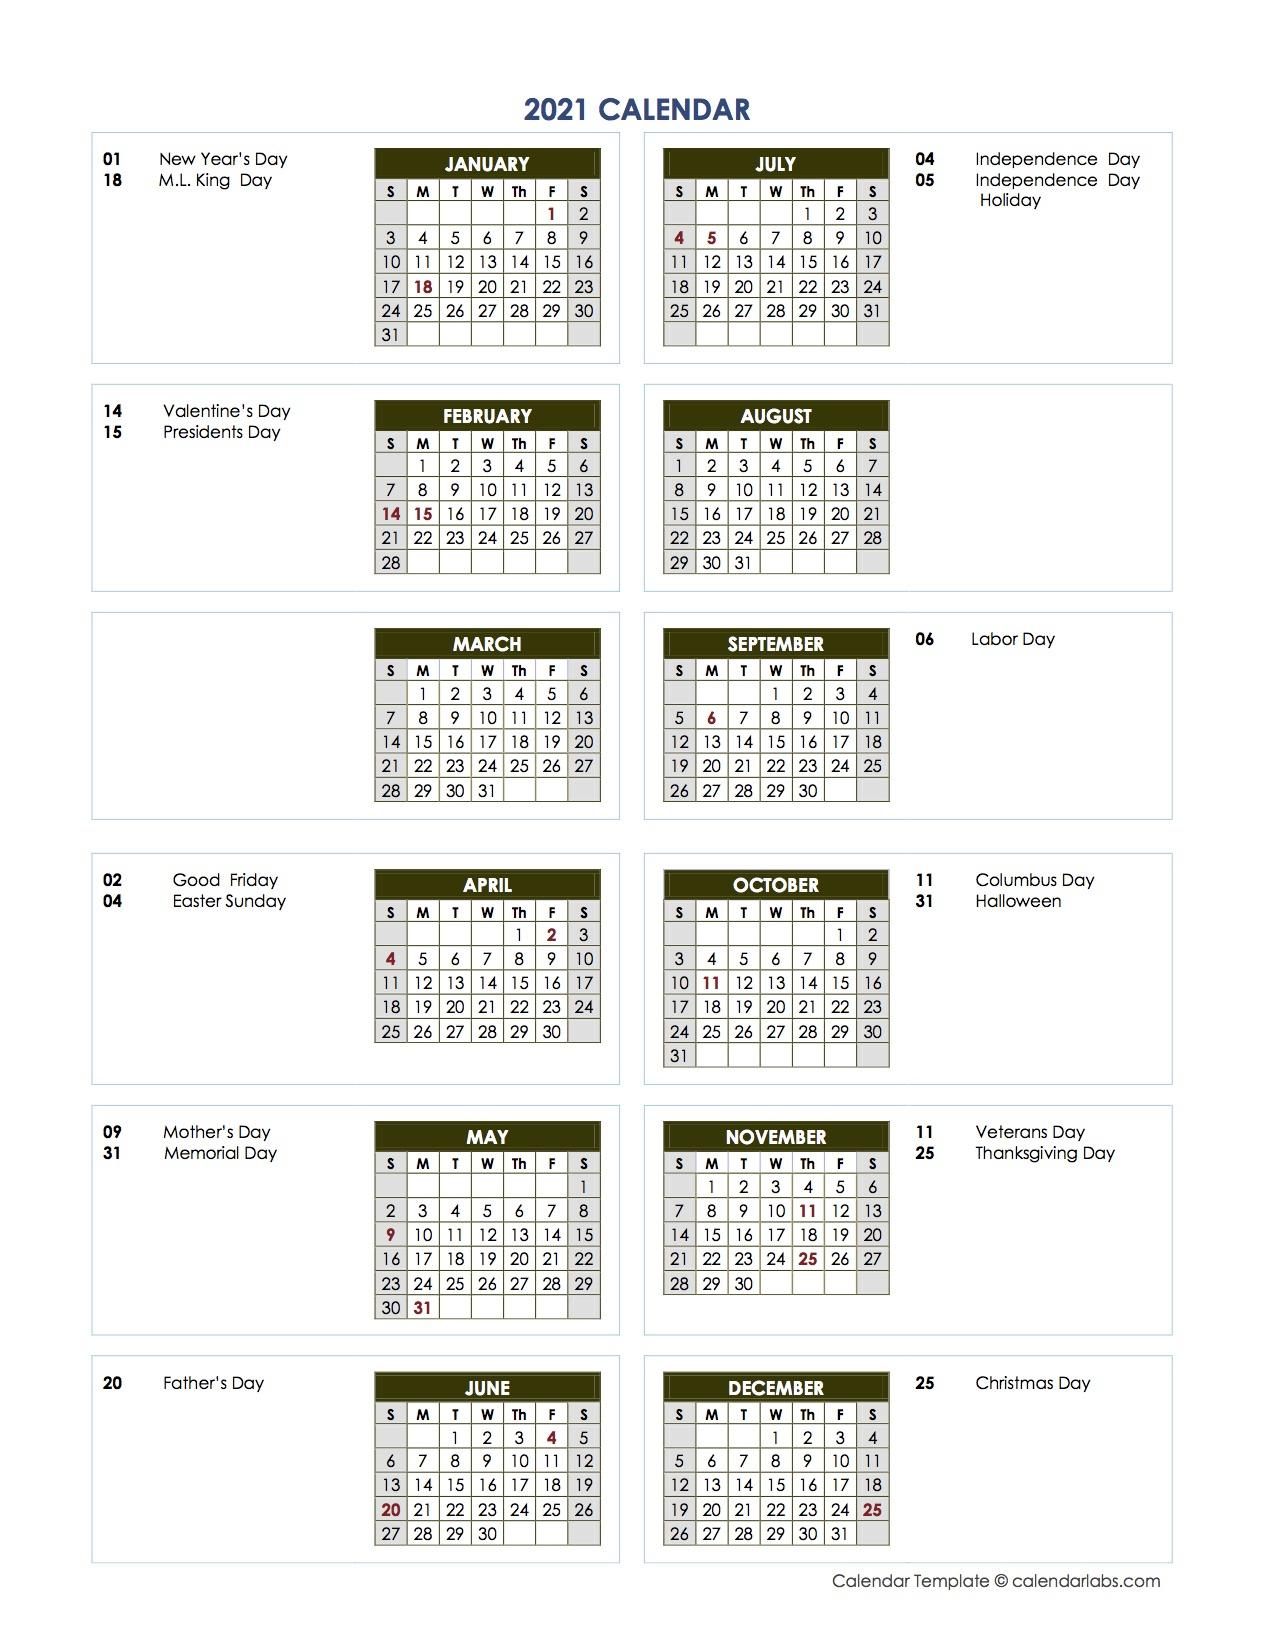 2021 Annual Calendar Vertical Template - Free Printable